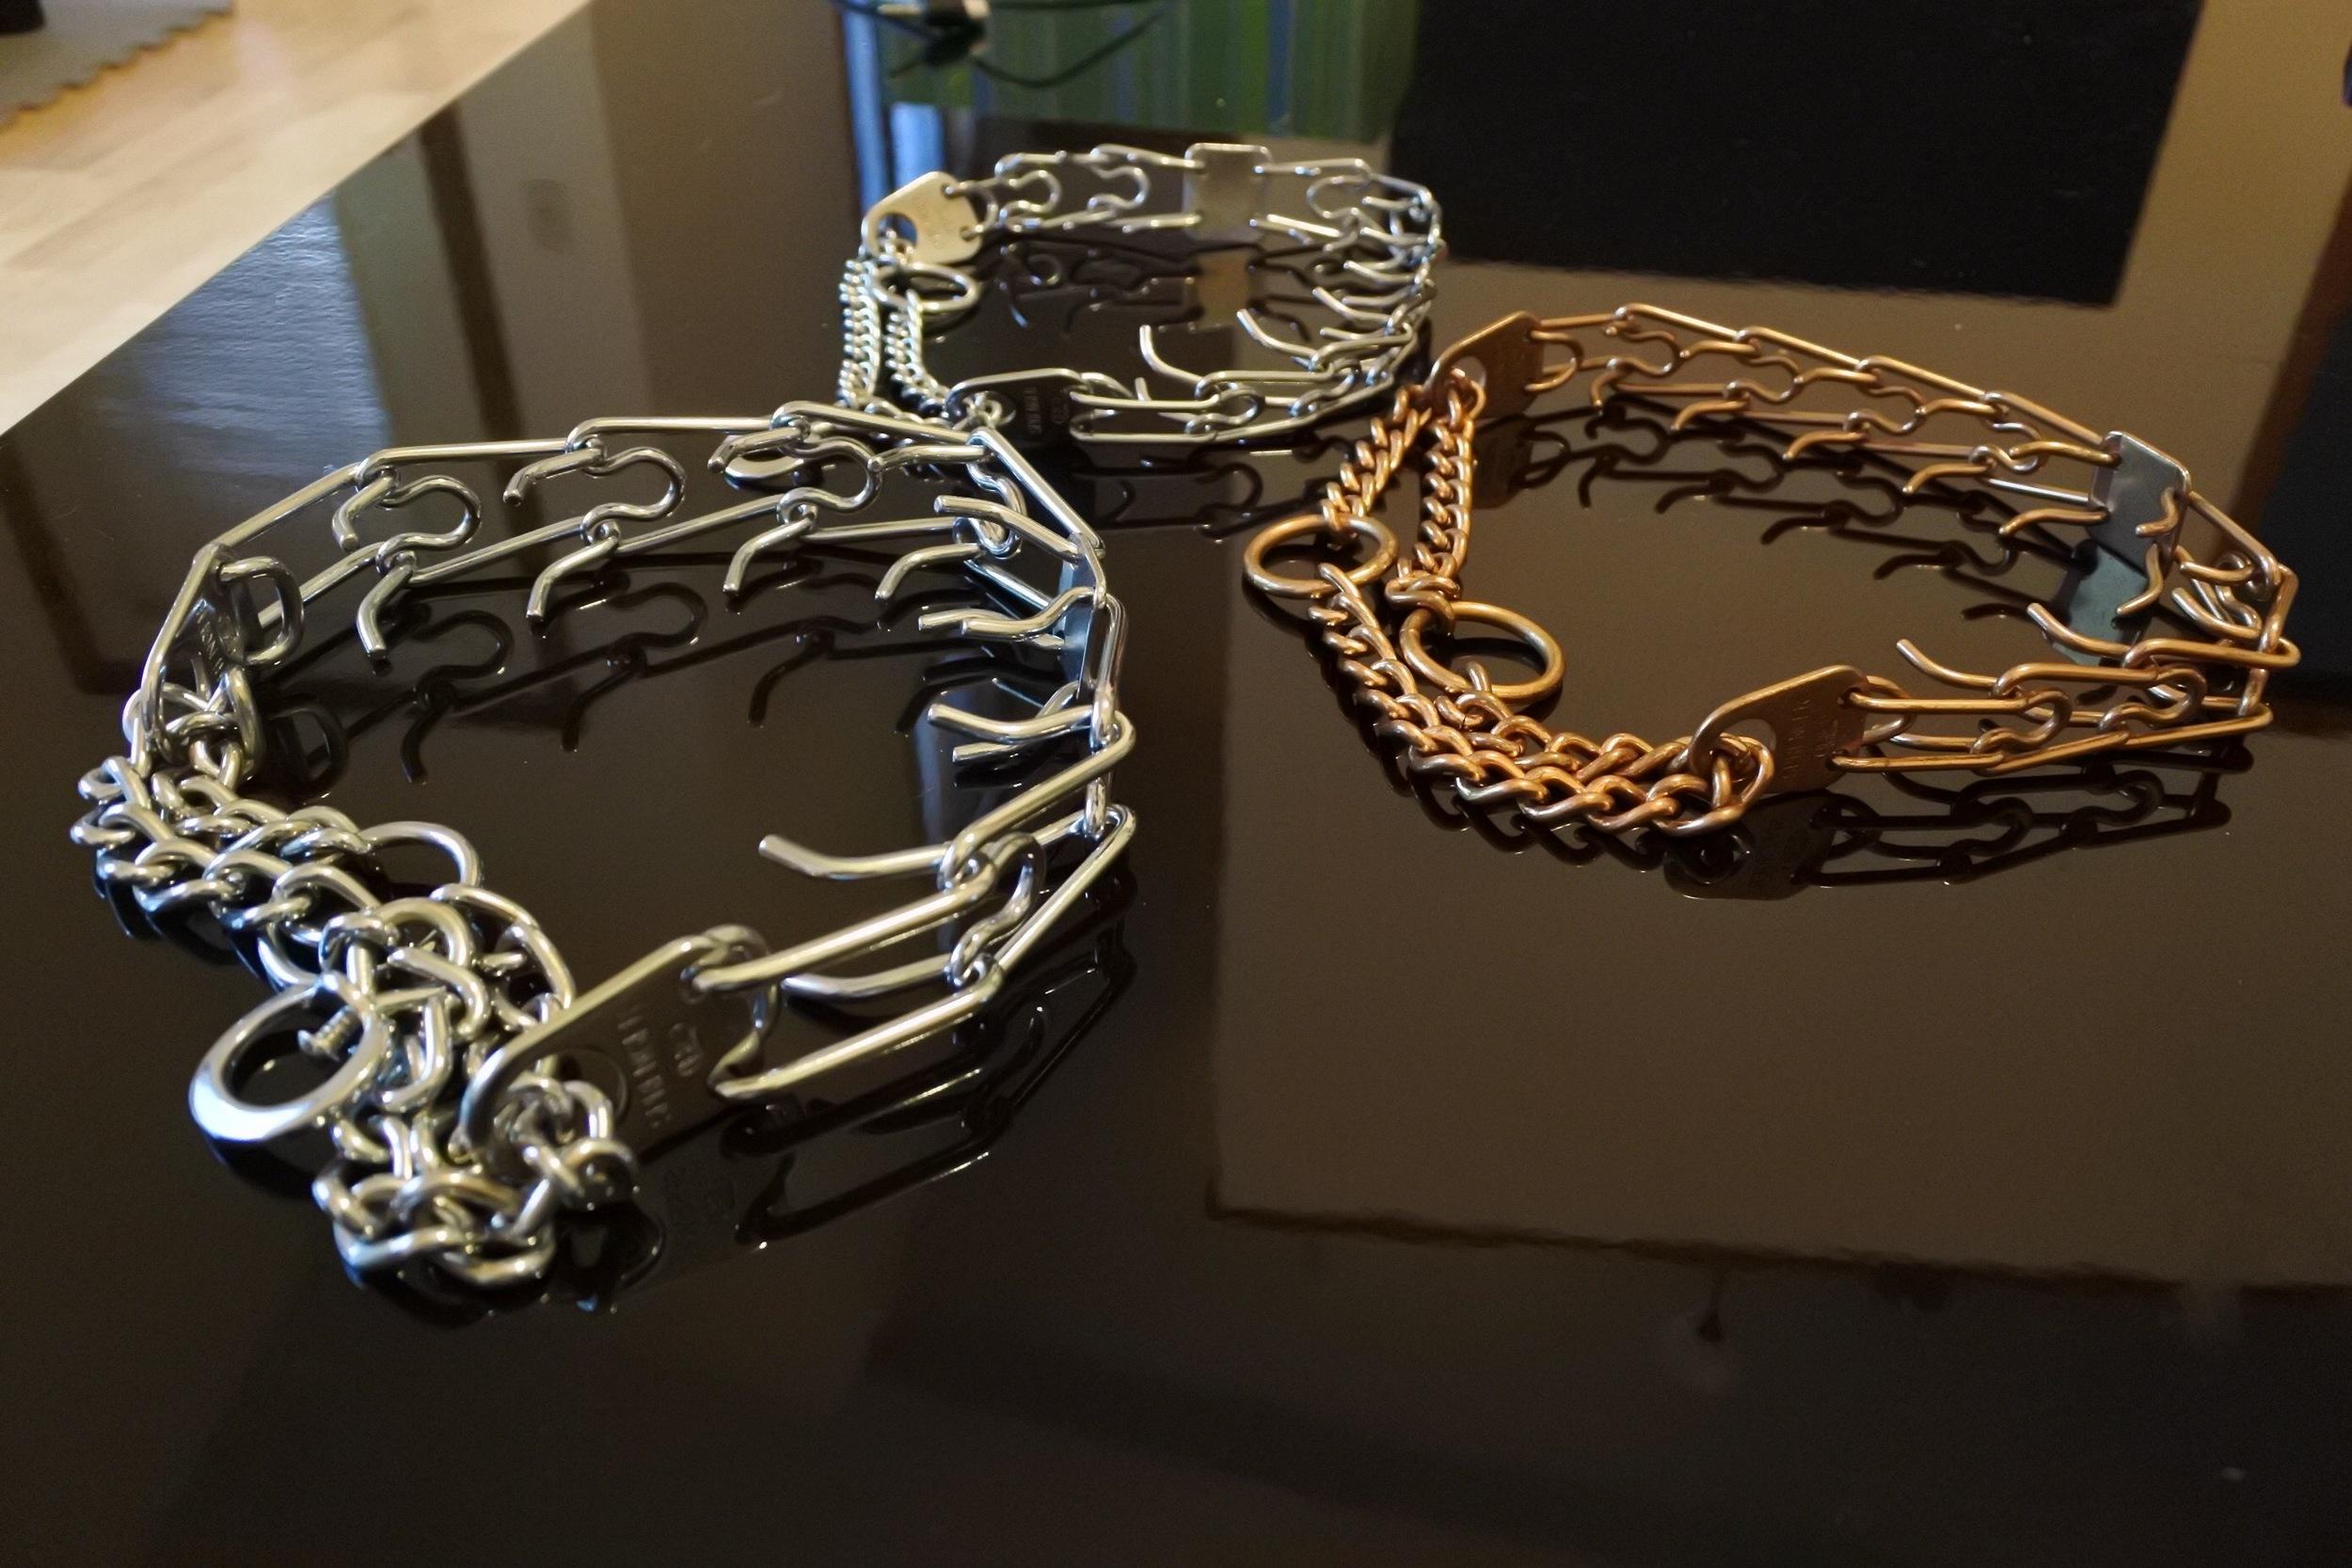 Prong collars